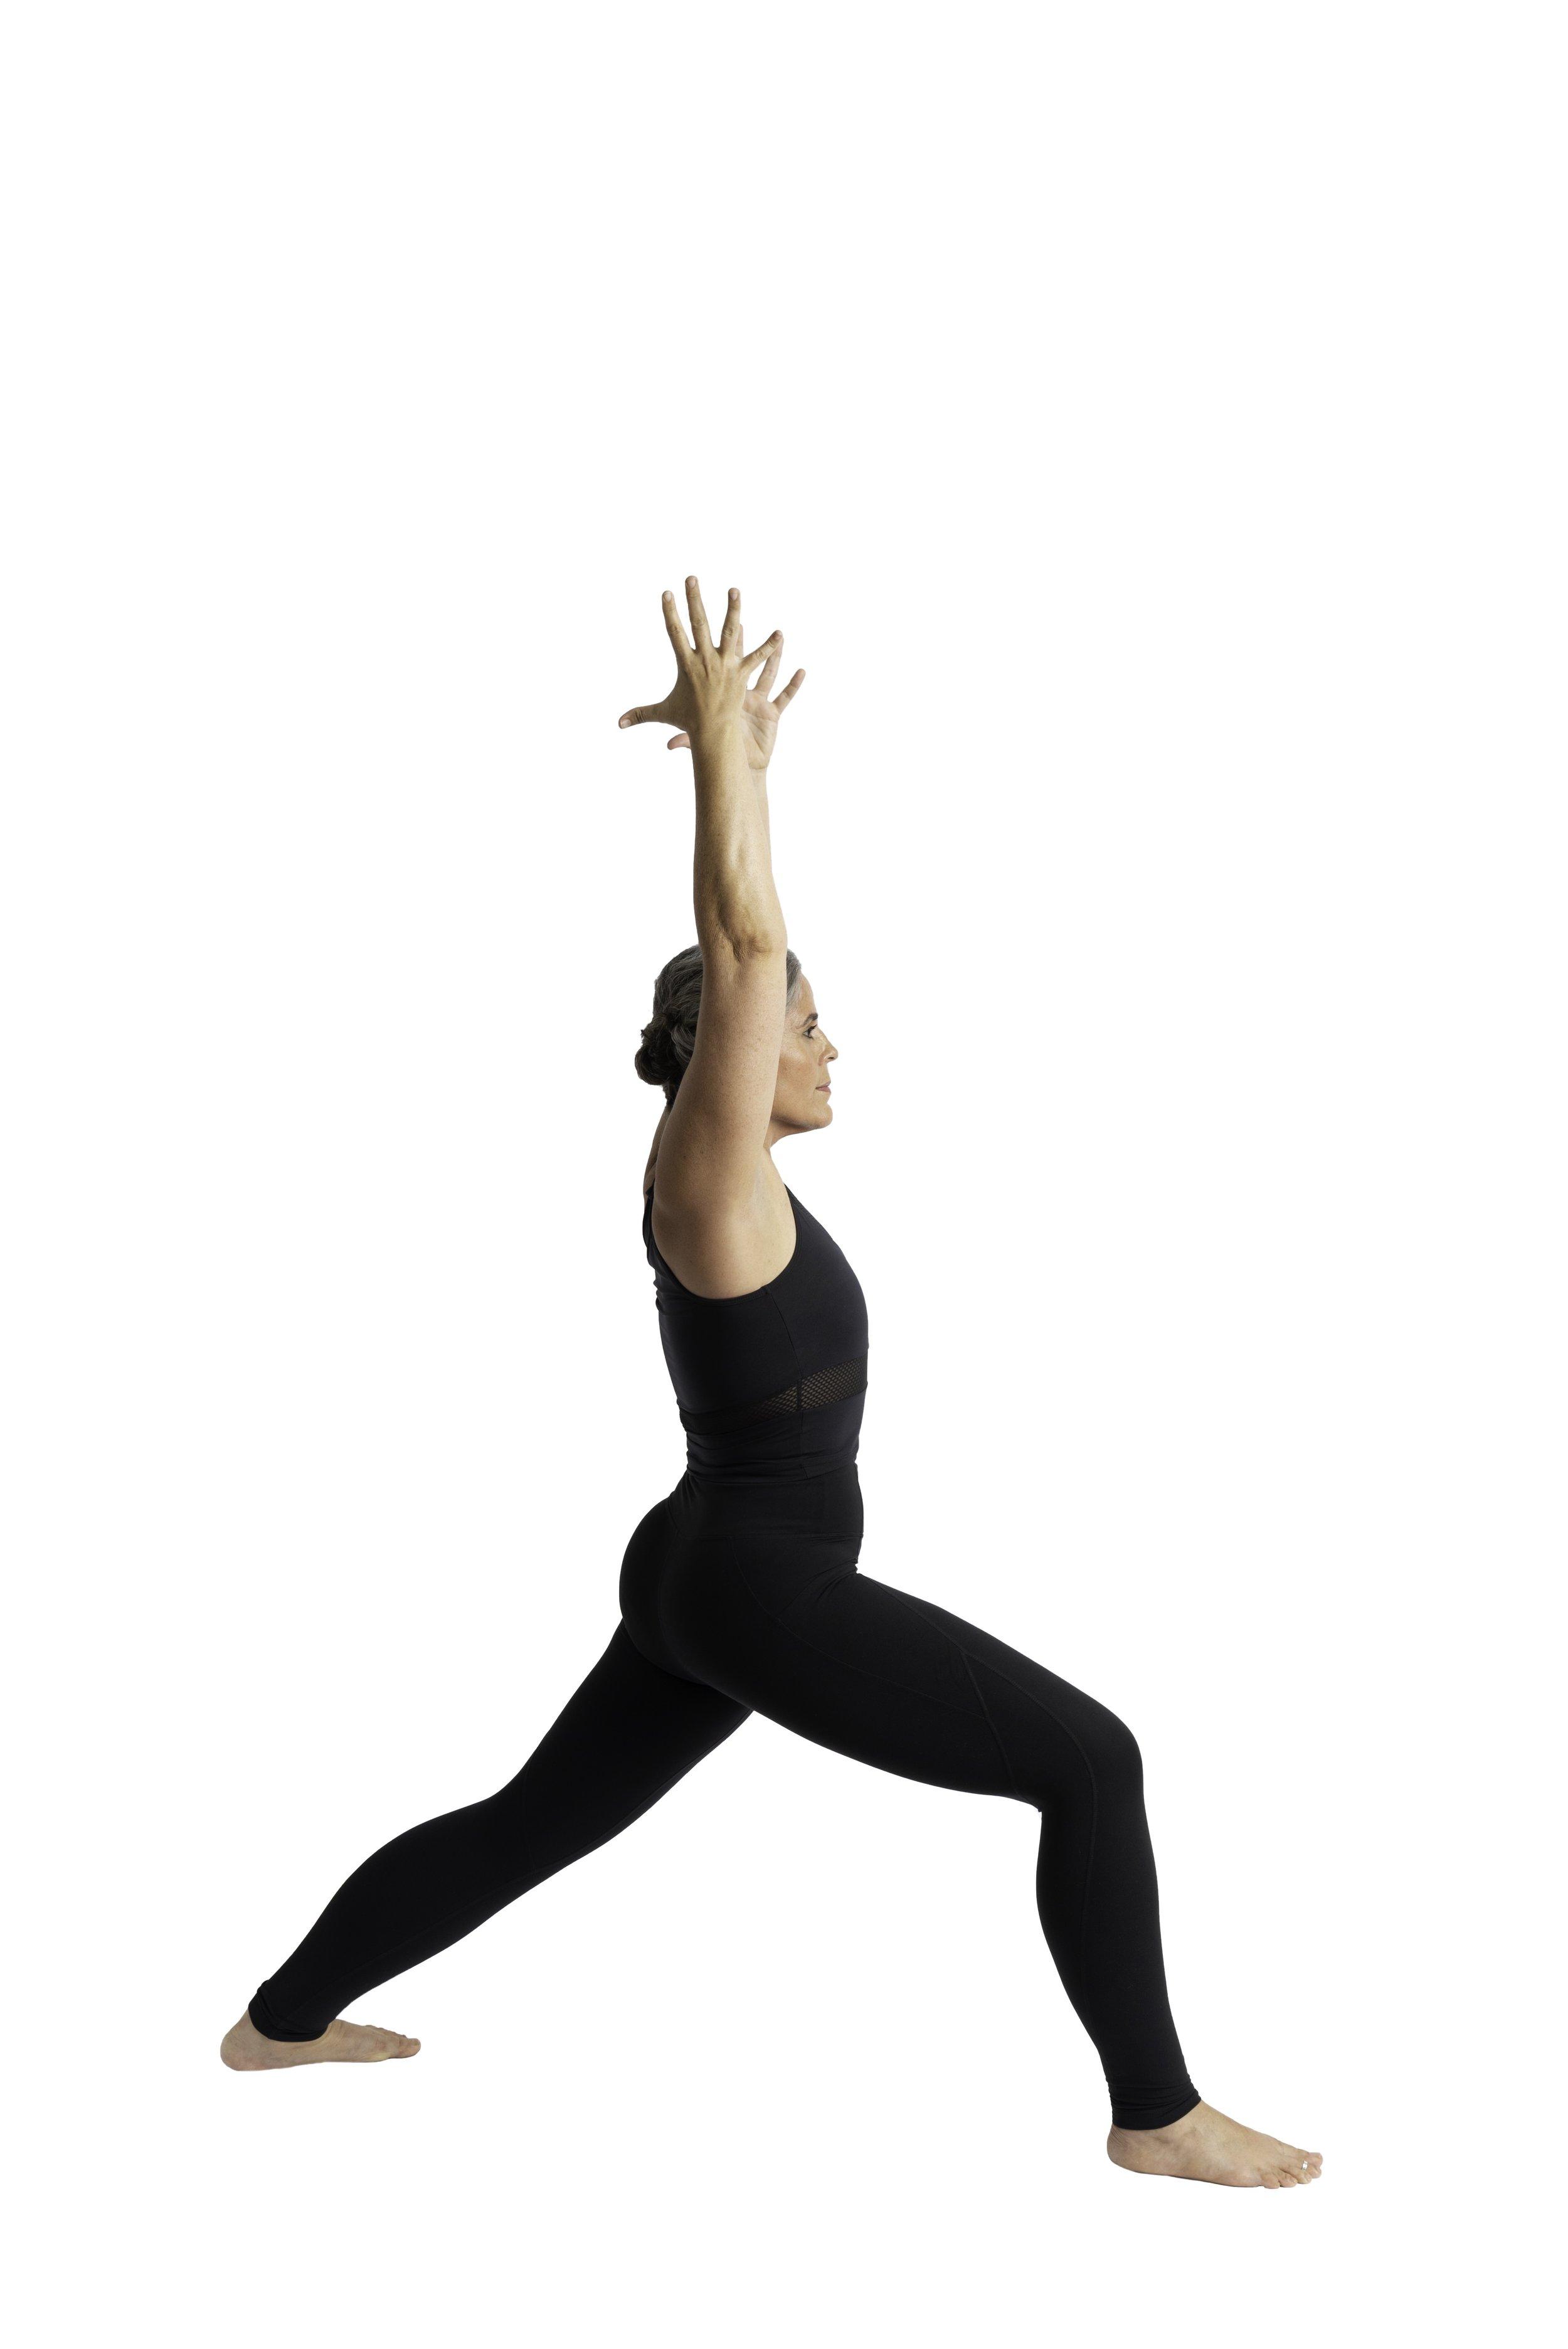 Warrior I pose: back heel anchored down / asymmetrical pelvis